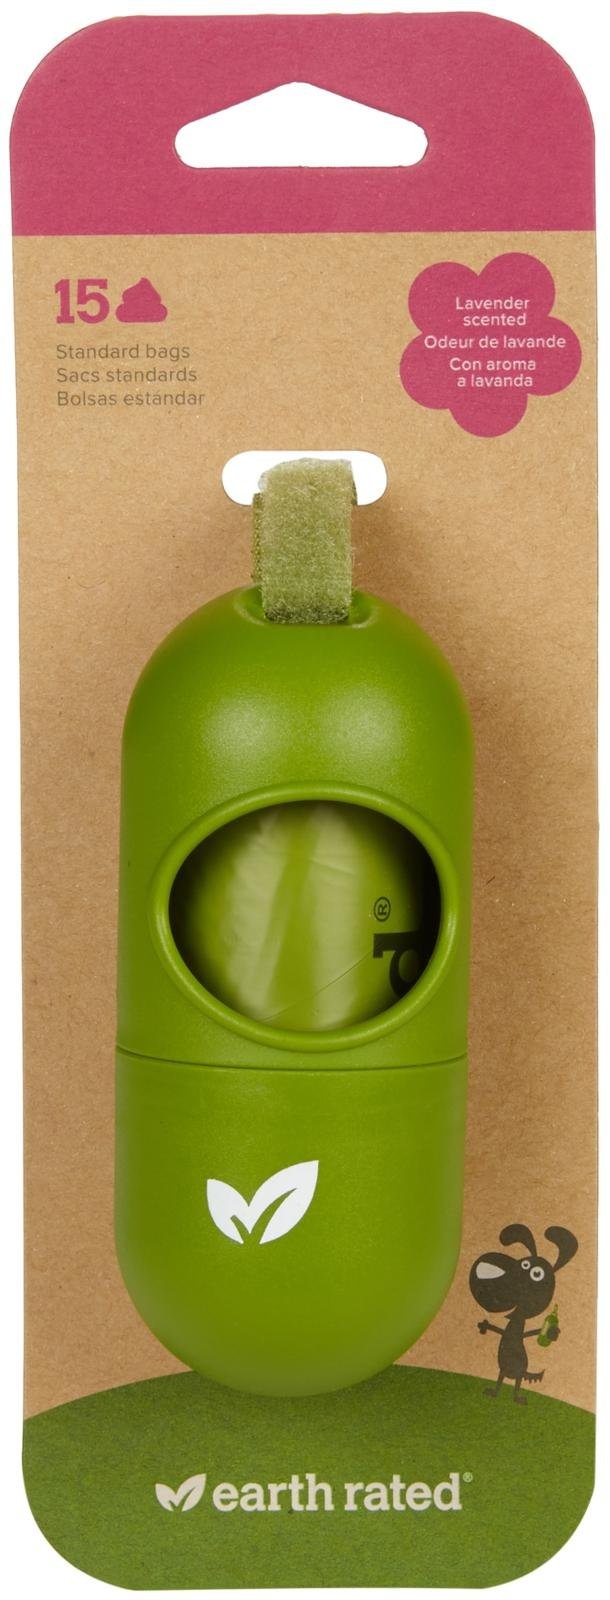 Earth Rated Poop Bag Green Dispenser (2-pack)